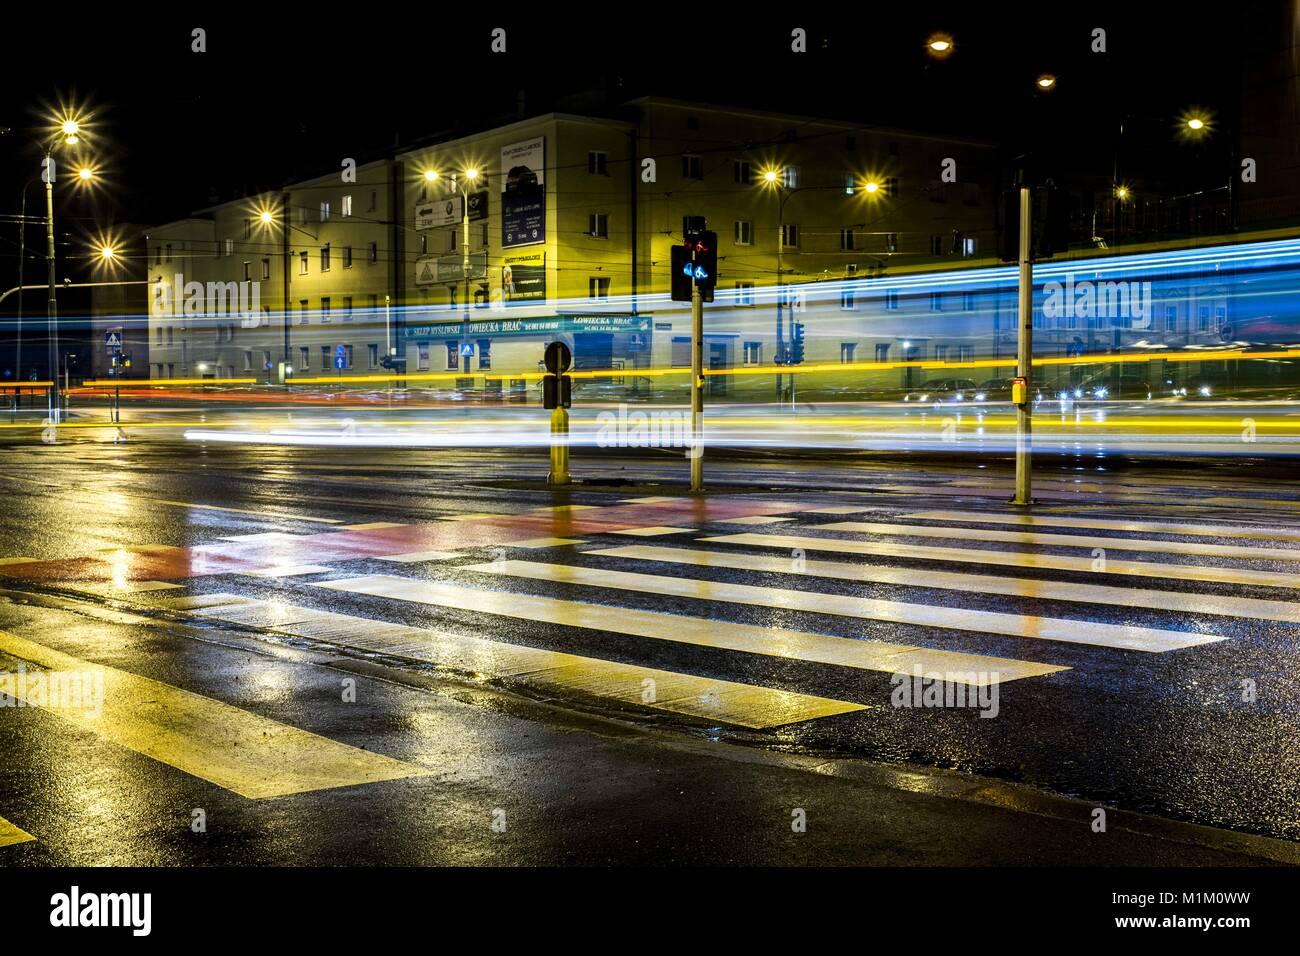 Poznan, Wielkopolska, Polonia. 31 gennaio, 2018. 31 gennaio 2018 - Poznan, Polonia - i paesaggi dipinti da le luci Foto Stock